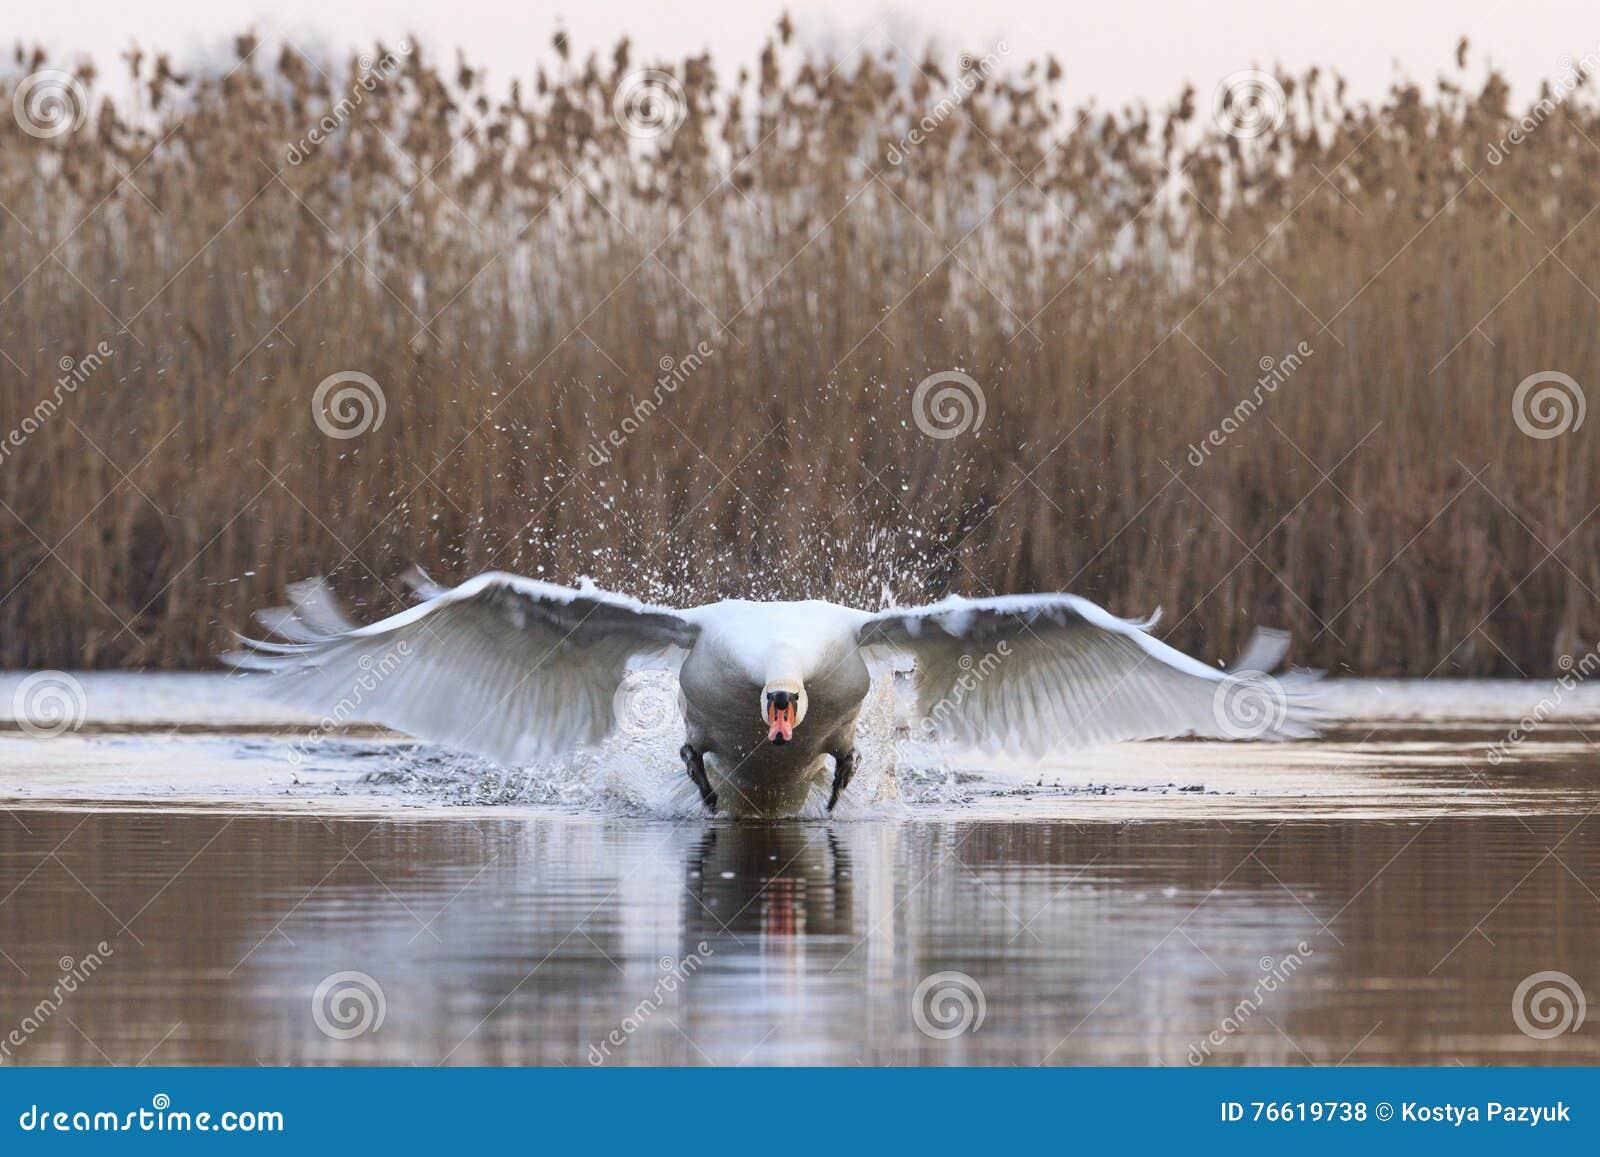 Mute swan accelerates tremendous speed